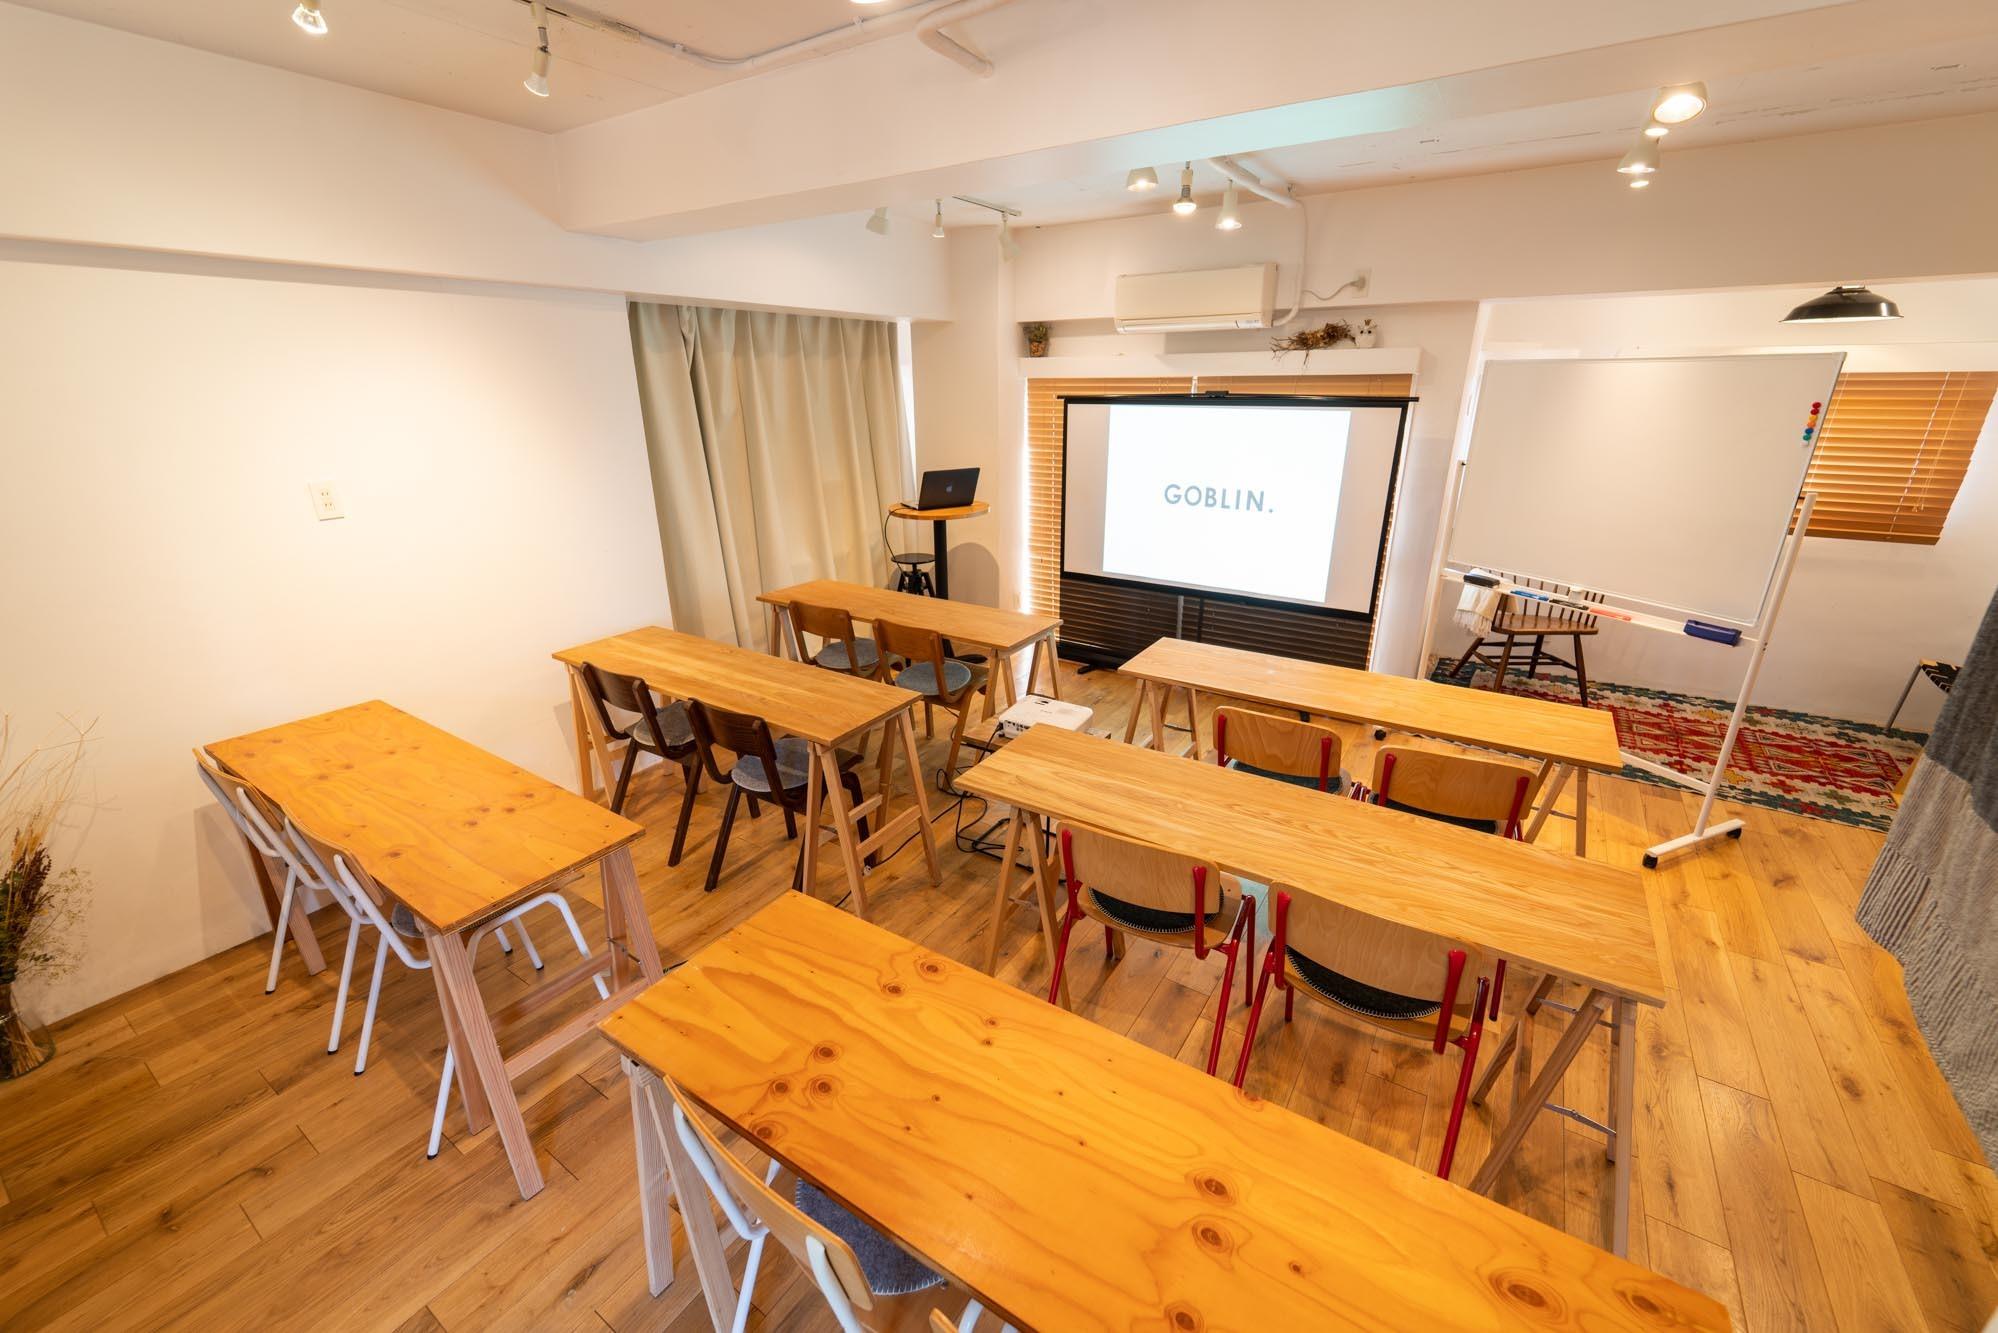 GOBLIN.原宿店 -GALLERY A/B- 【A】会議・セミナー・ウェビナーの室内の写真